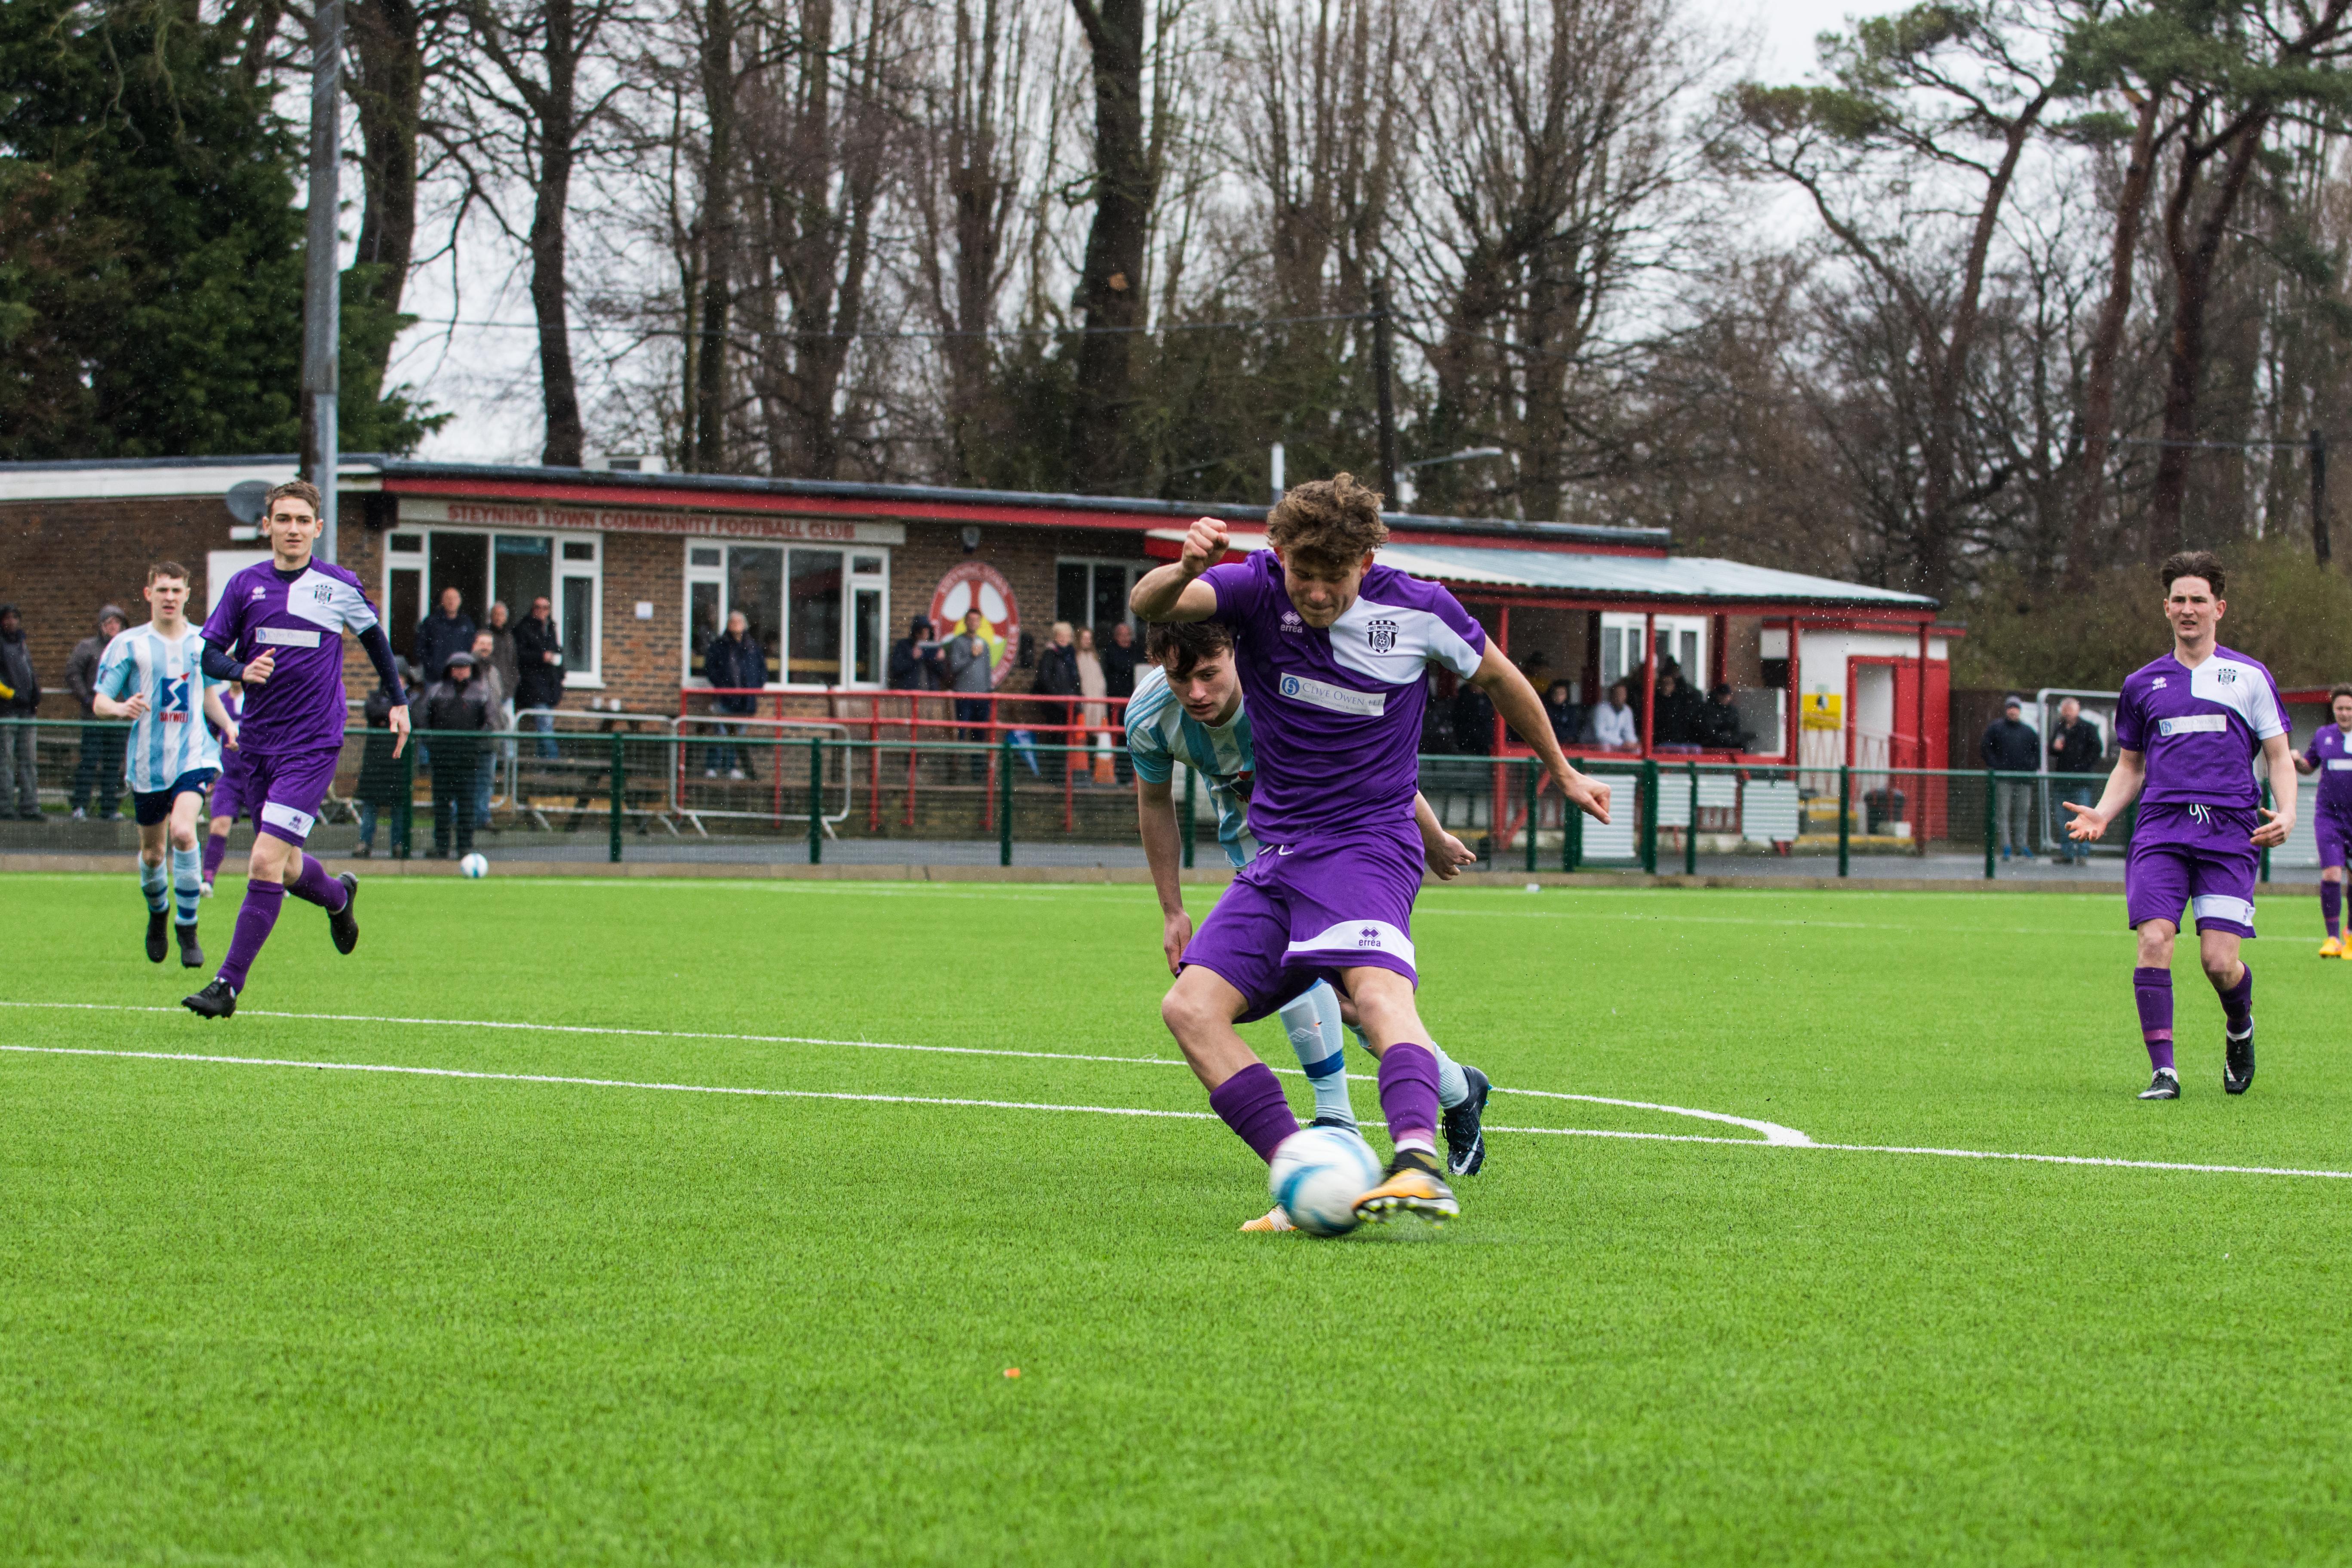 DAVID_JEFFERY Worthing United FC vs East Preston FC 02.04.18 22